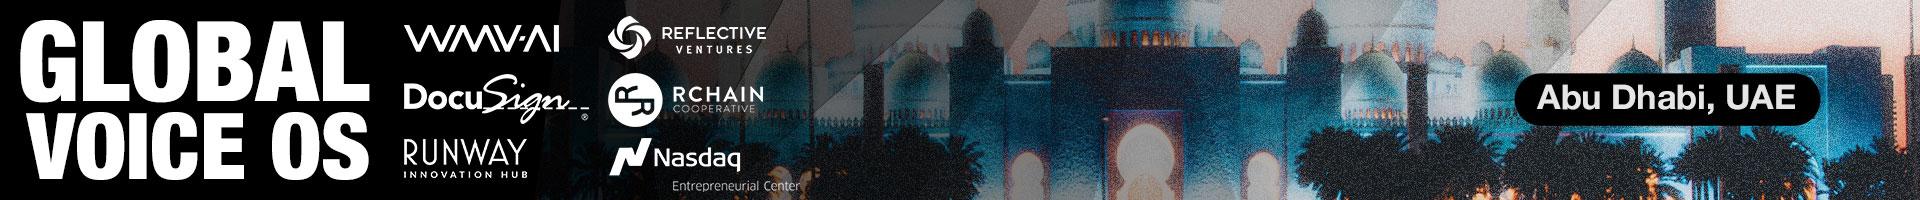 Event-Global-Voice-OS-1920x200-Abu-Dhabi-UAE